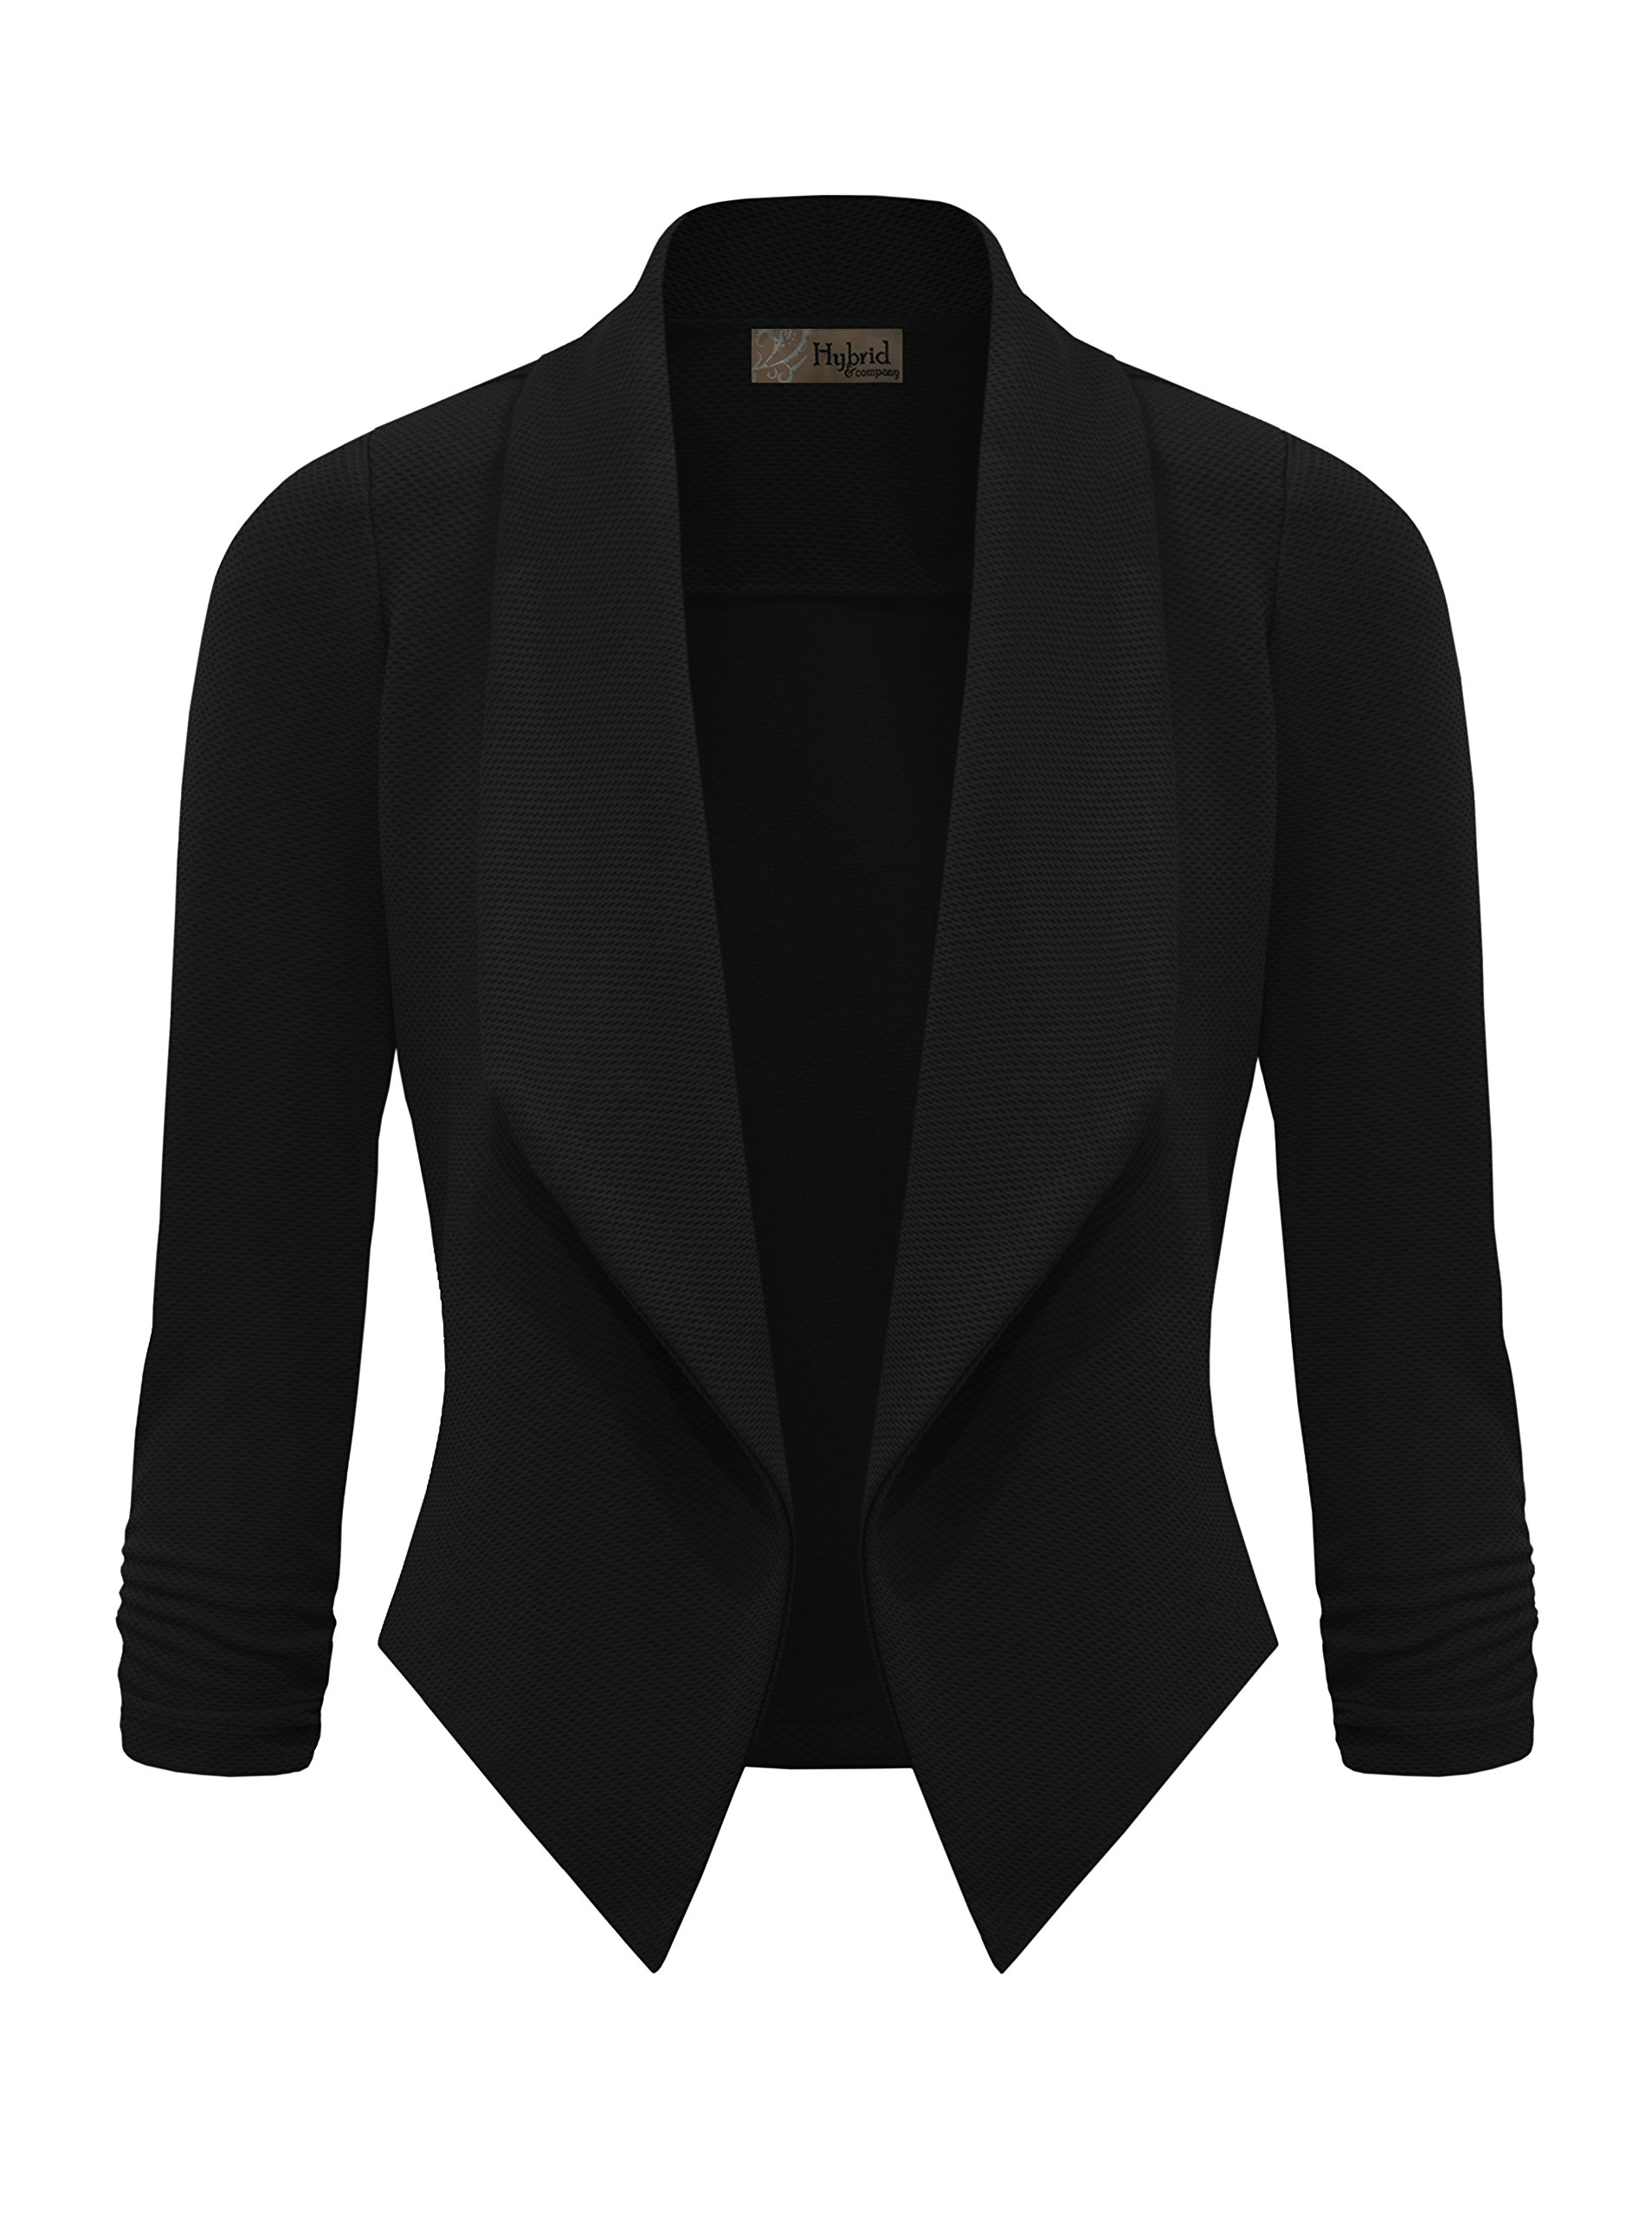 HyBrid & Company Womens Casual Work Office Open Front Blazer JK1133 E3500 Black M by HyBrid & Company (Image #2)